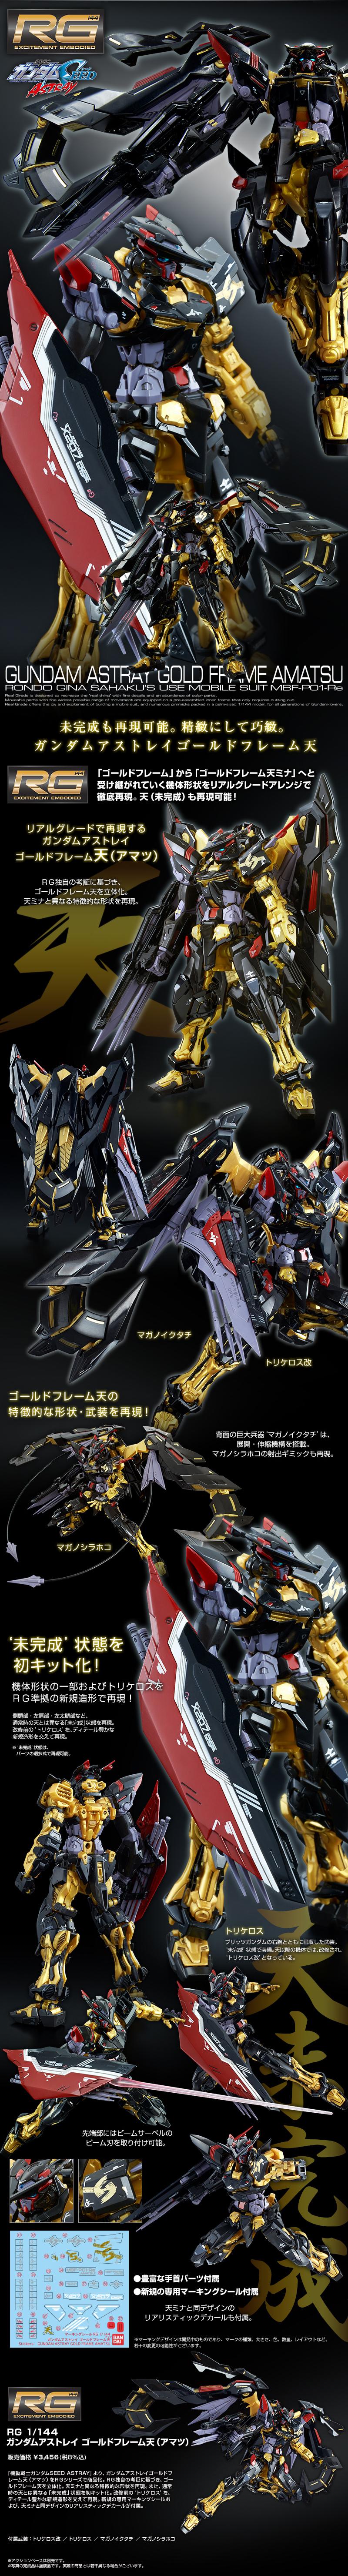 RG 1/144 MBF-P01-Re ガンダムアストレイゴールドフレーム天 [Gundam Astray Gold Frame Amatsu] 公式商品説明(画像)